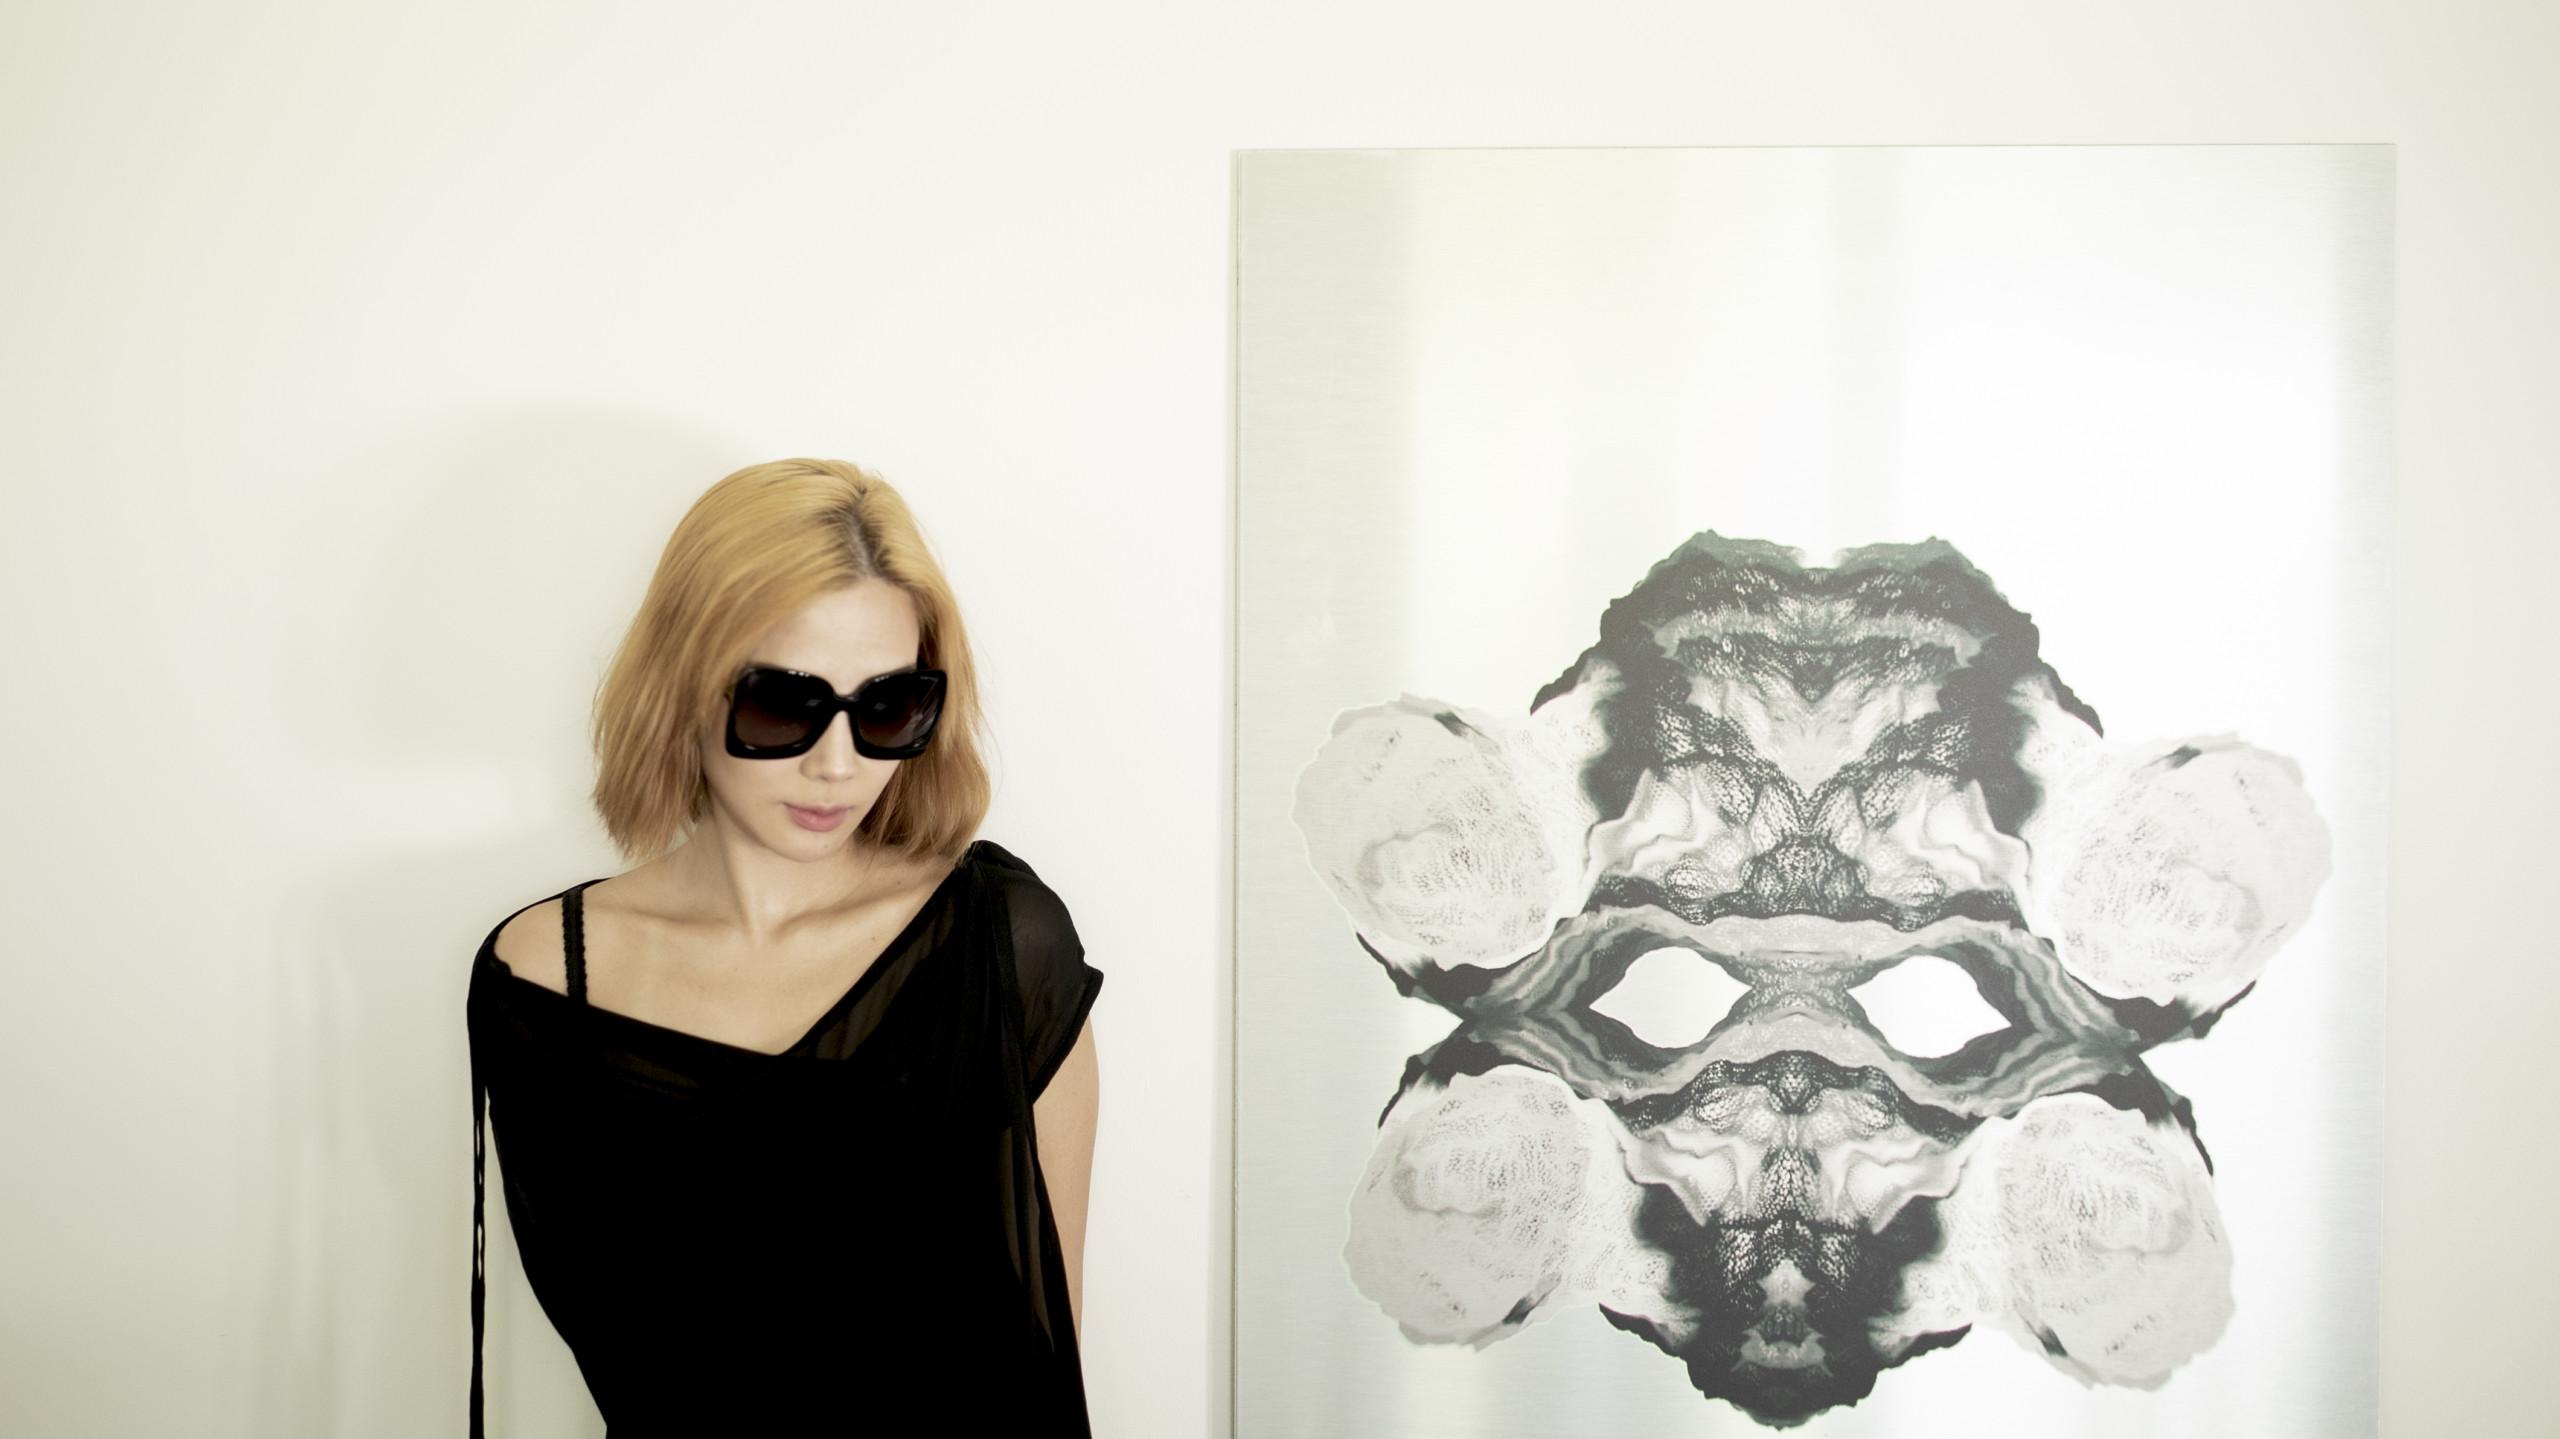 gallerist nalada taechanarong poses in sunglasses next to metal on canvas artwork